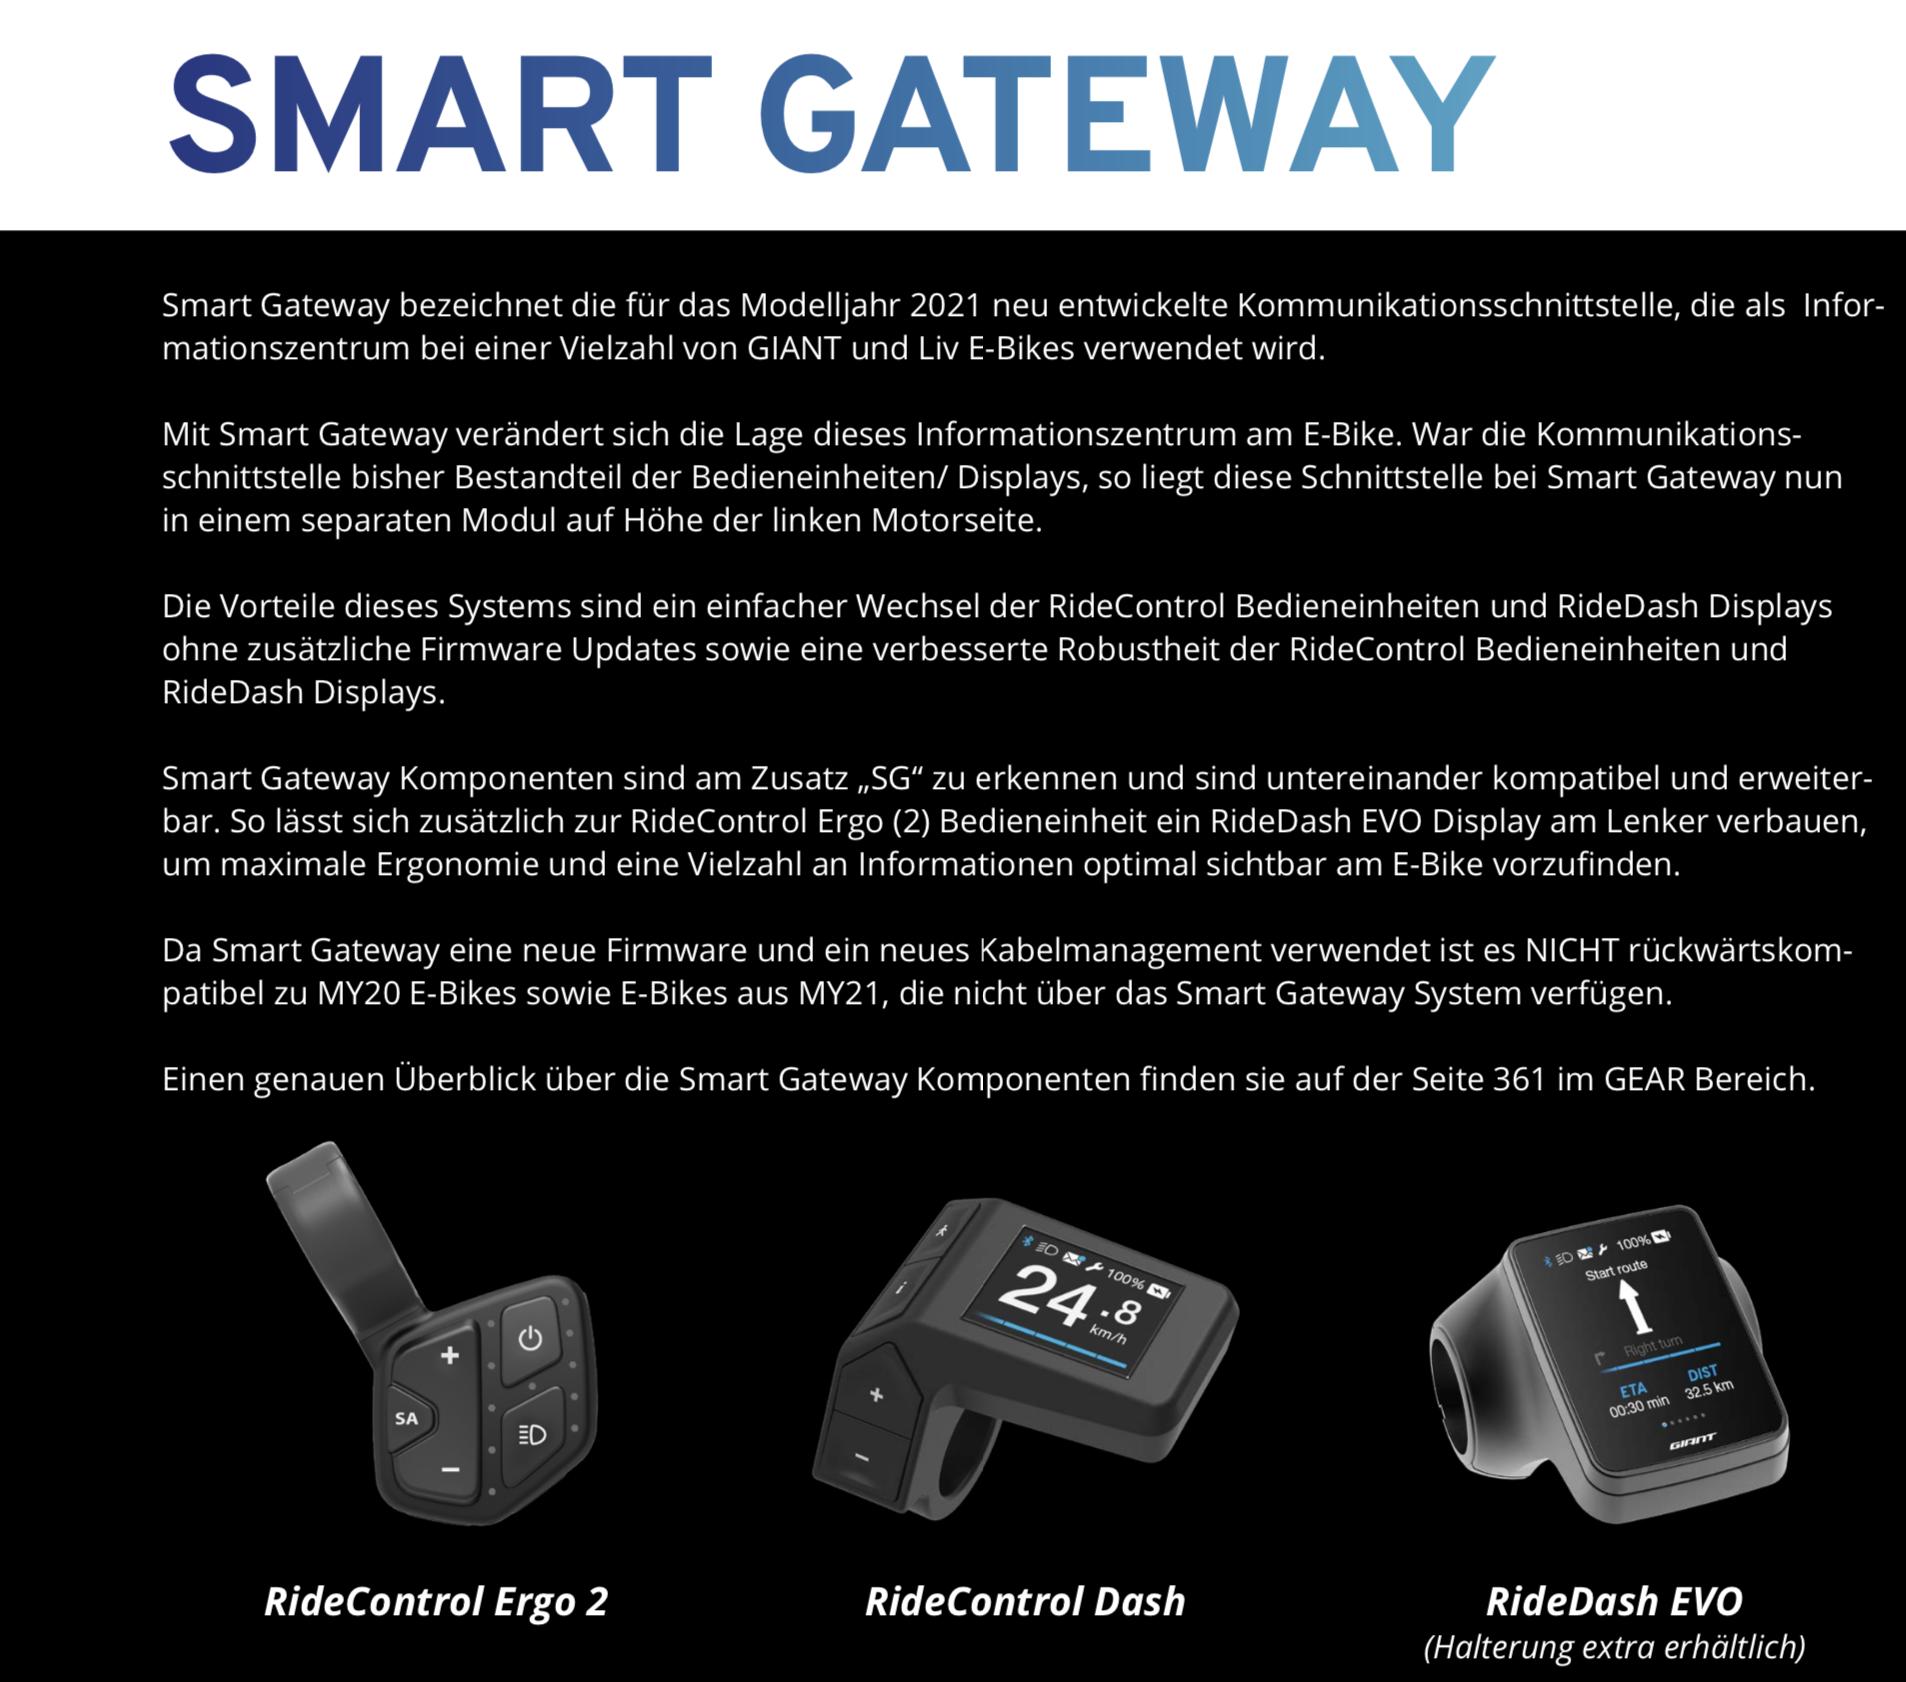 GIANT Explore E+ 1 PRO GTS Modell 2021